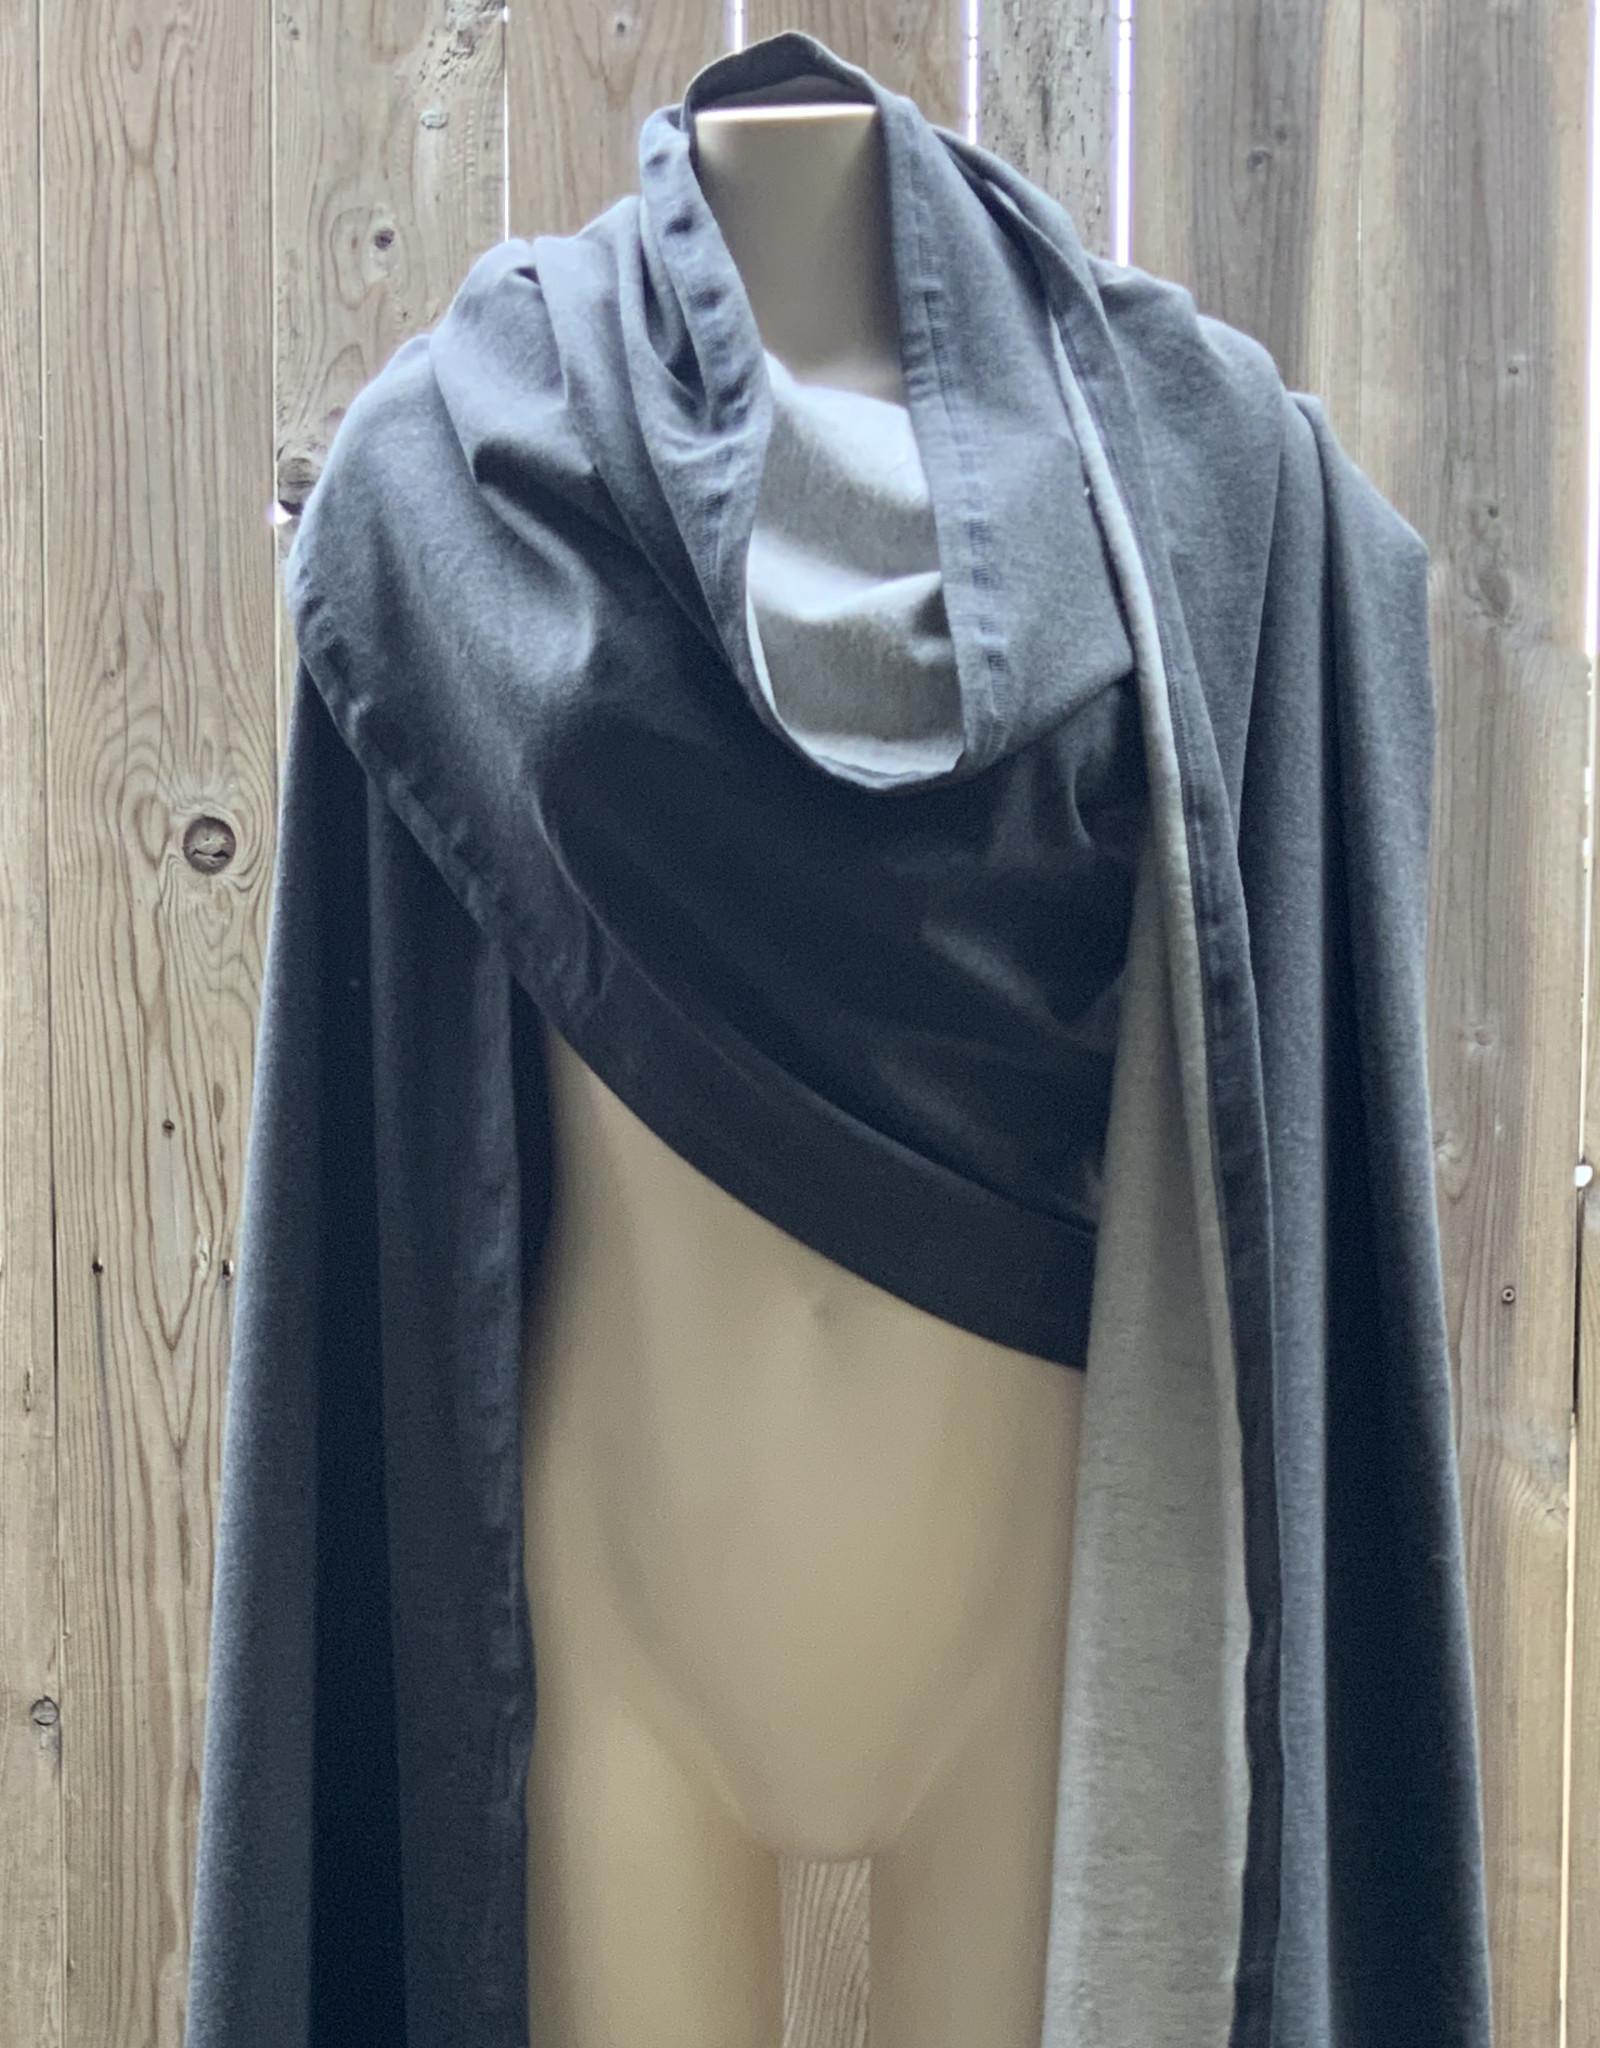 Devil May Wear Luxurious Long Merino Wrap, 3.65m, 86% Rayon From Bamboo, 9% Merino Wool, 5% Spandex, Charcoal